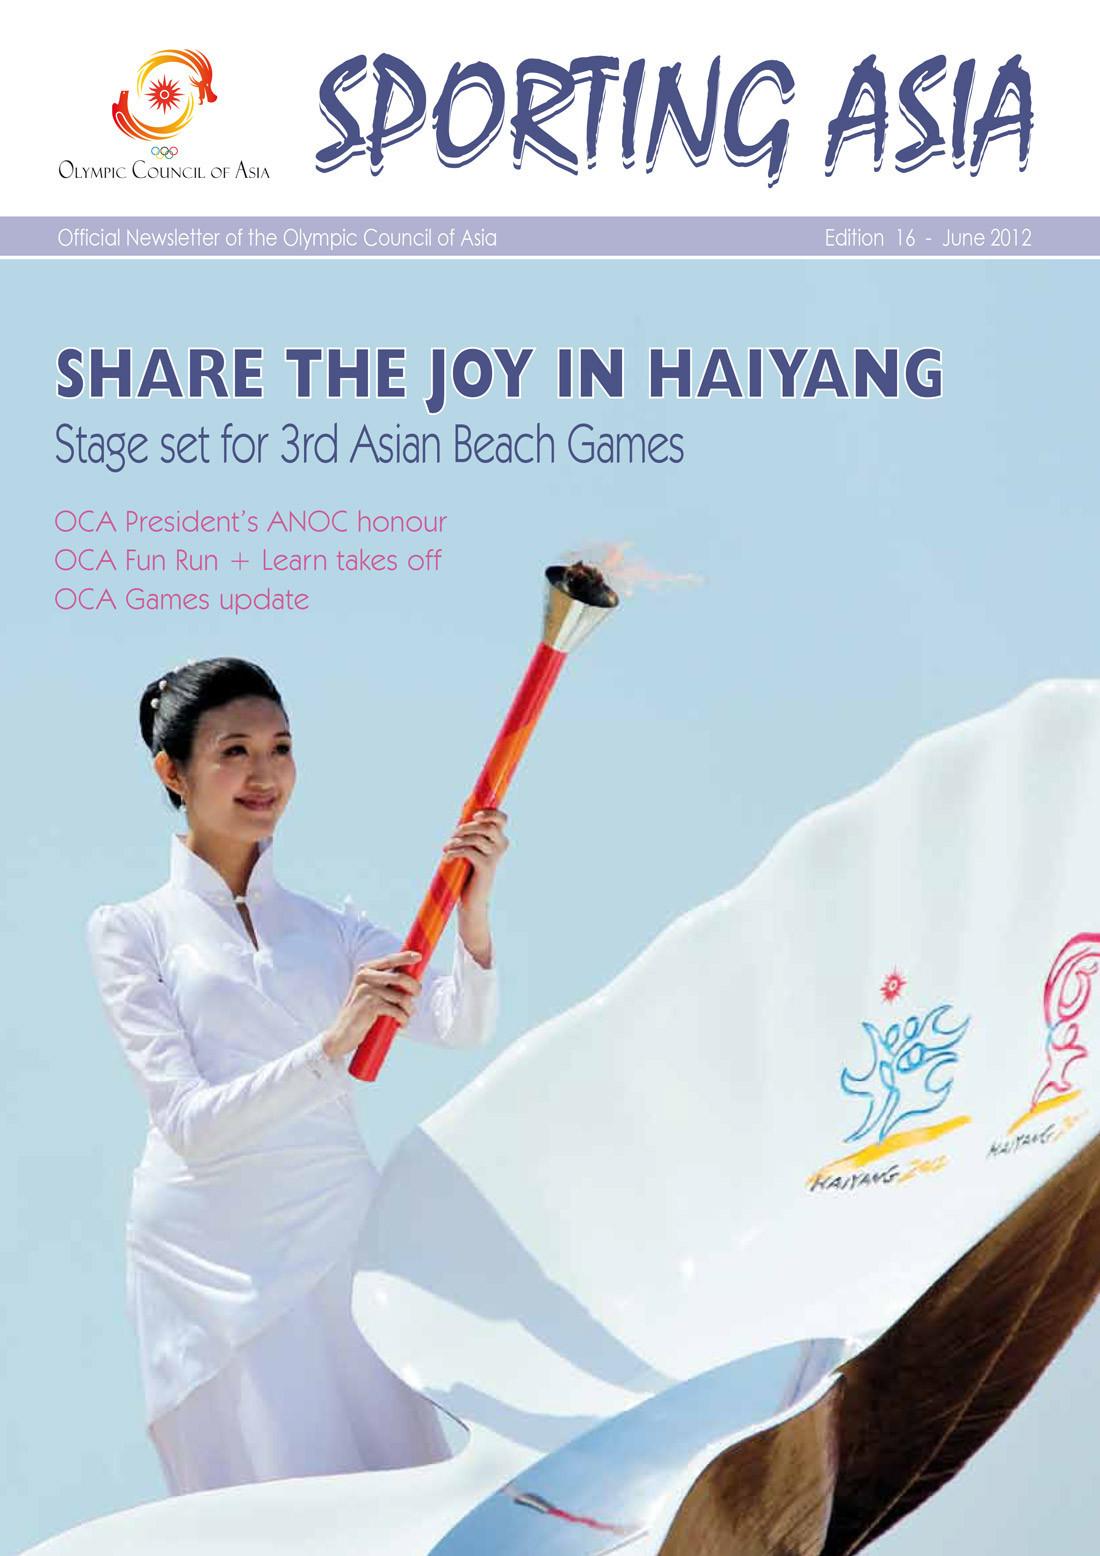 Sporting Asia - Edition 16 - JUN 2012